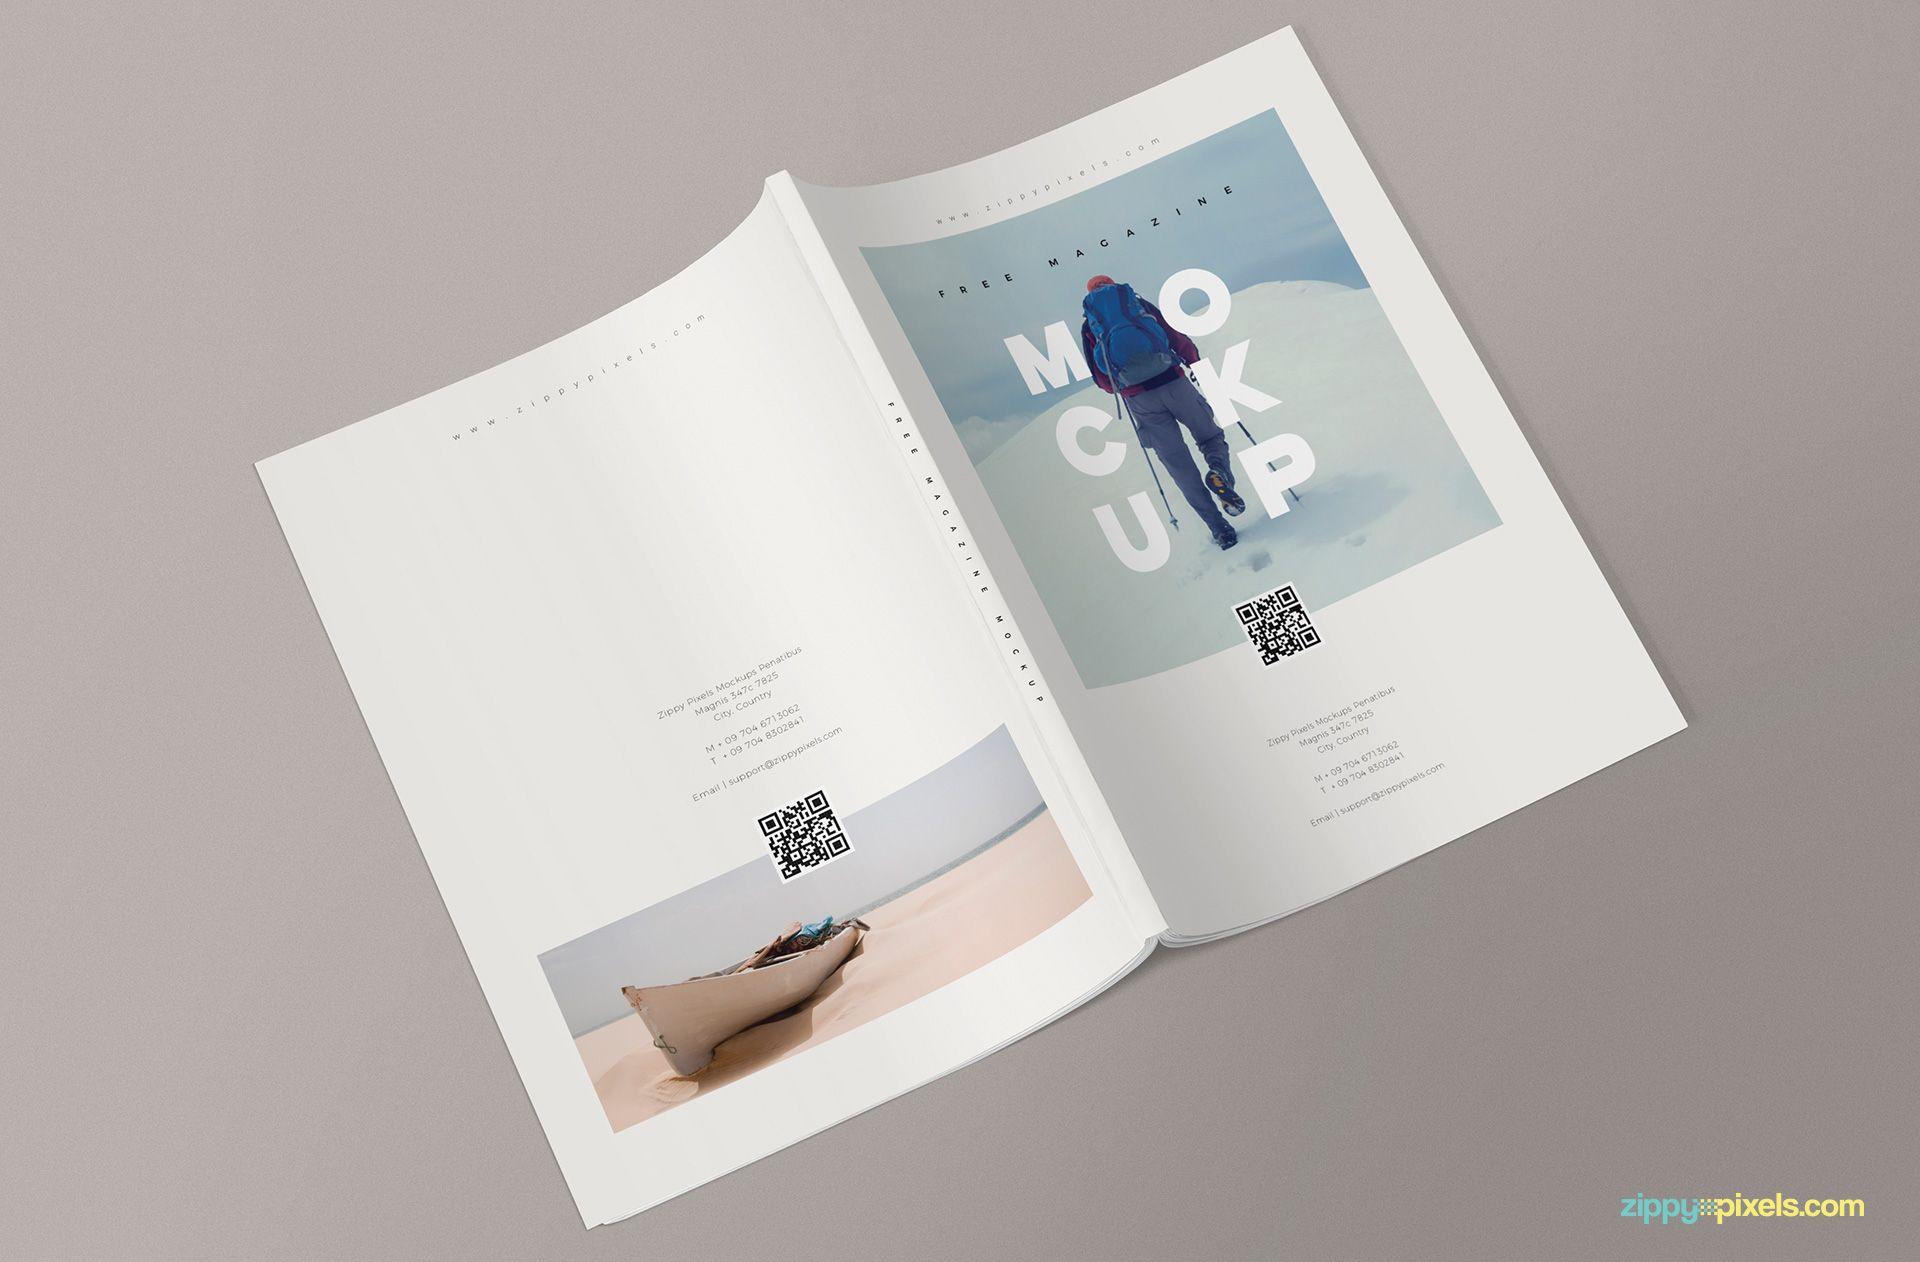 3 Free Magazine Mockup Templates Book Design Layout Mockup